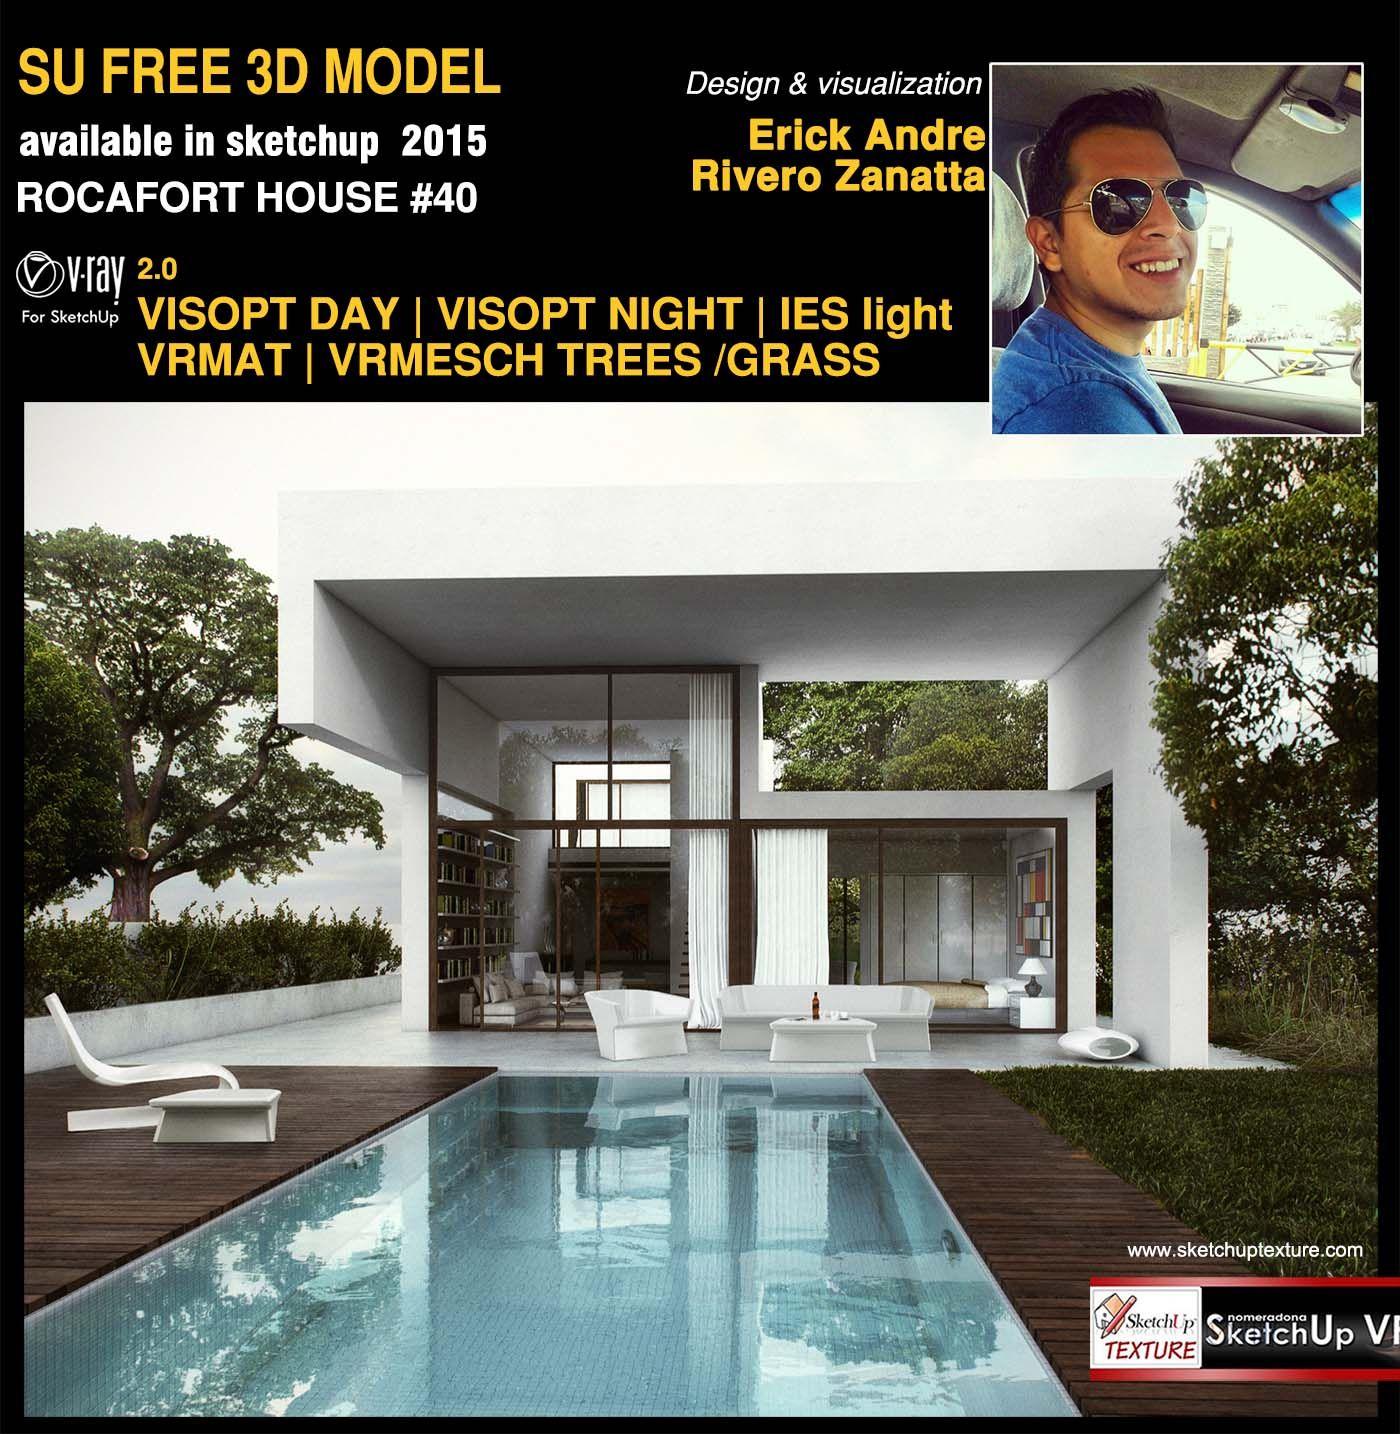 Free sketchup 3d model Rocafort house #40 vray render day